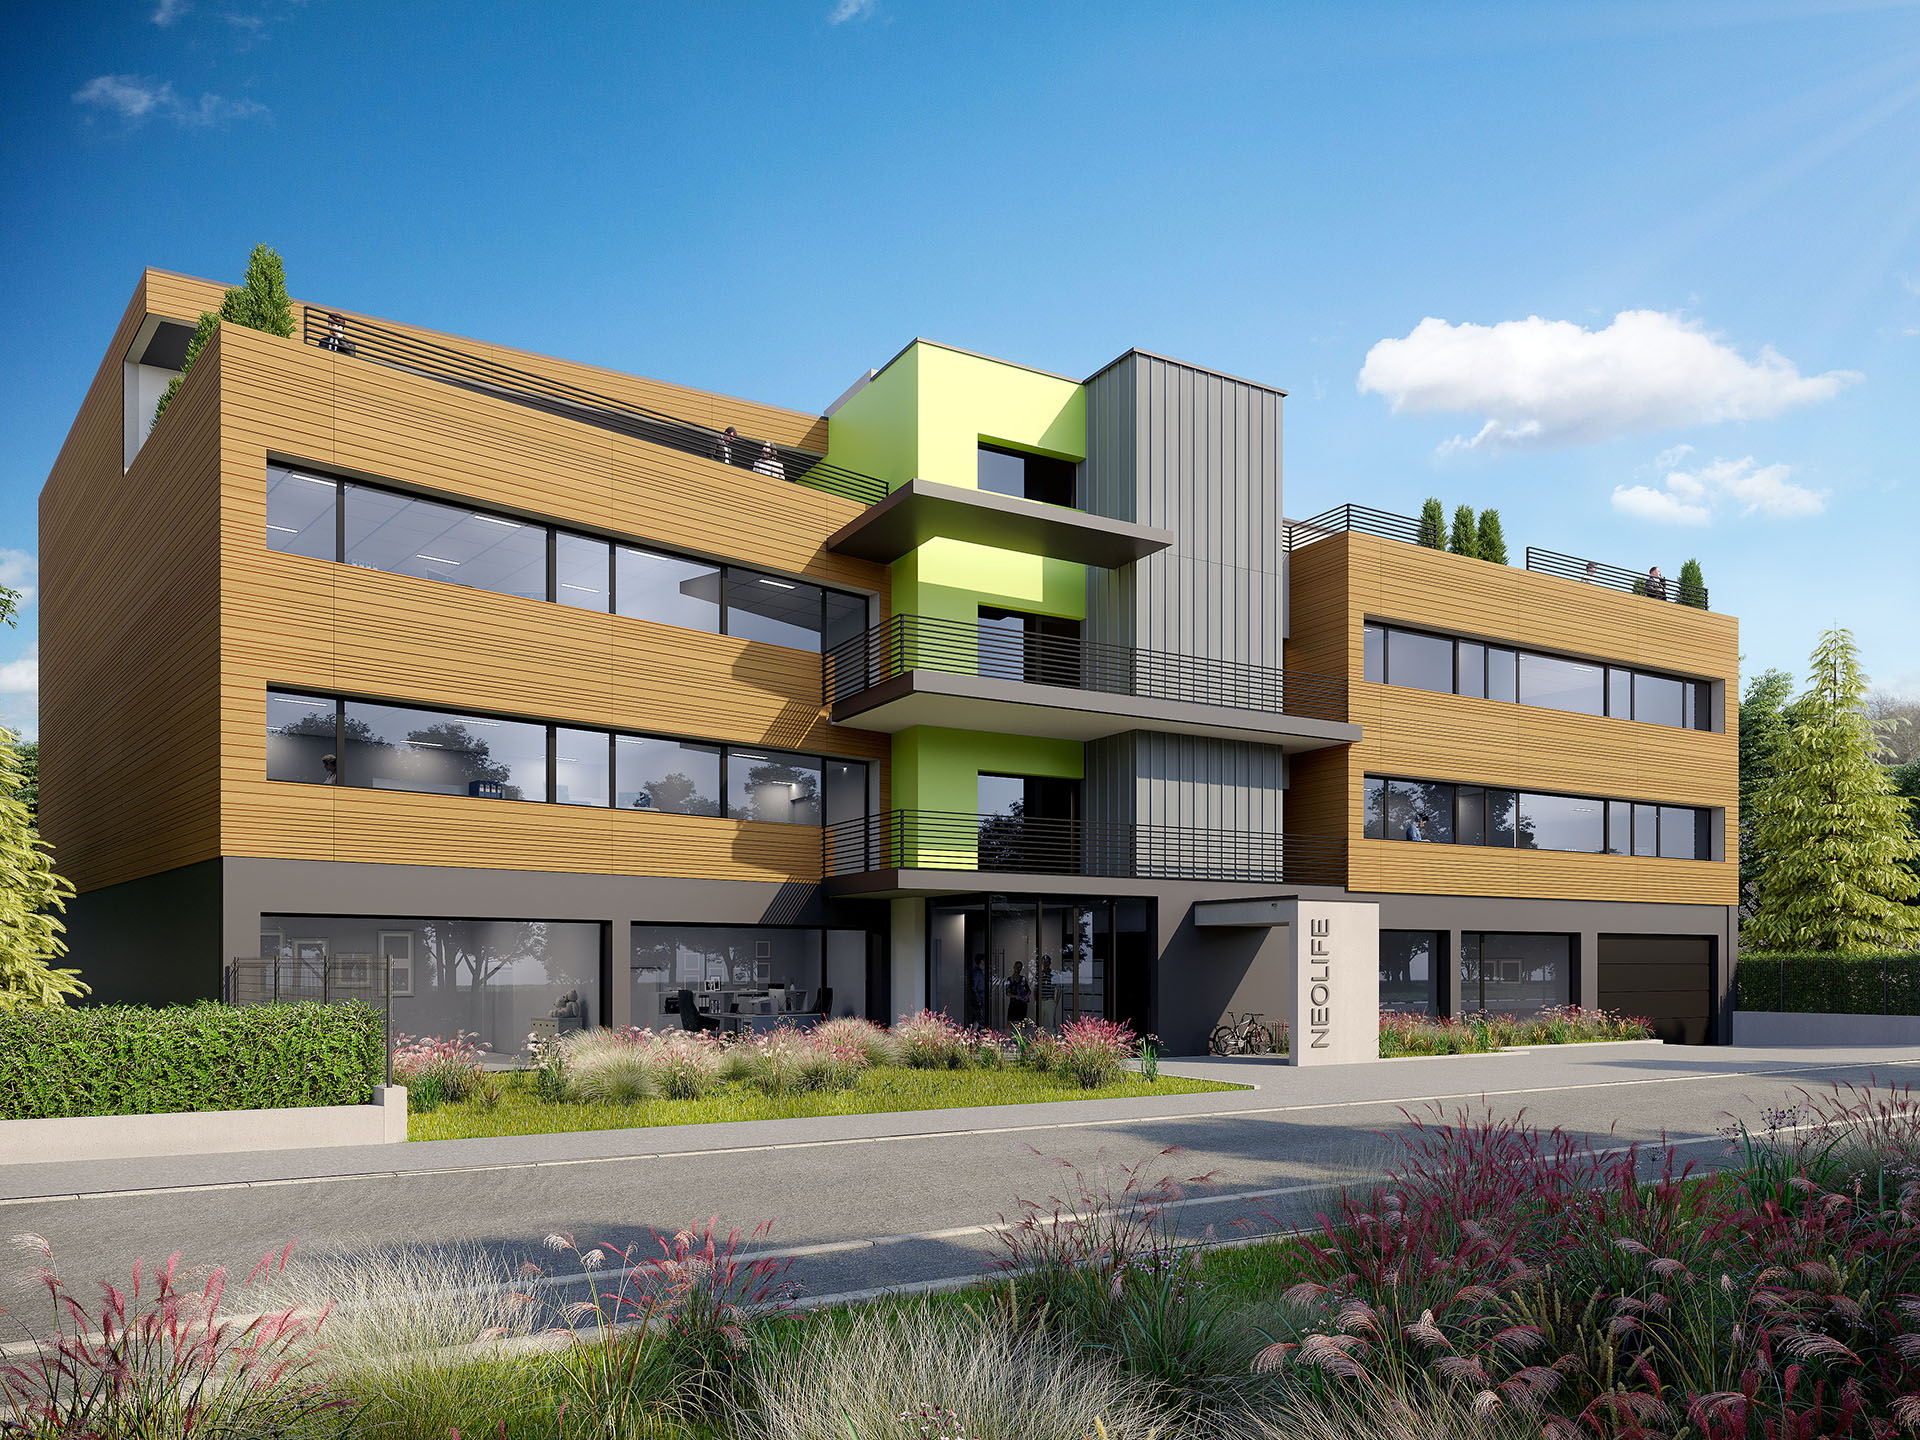 3D exterior view of a modern office building